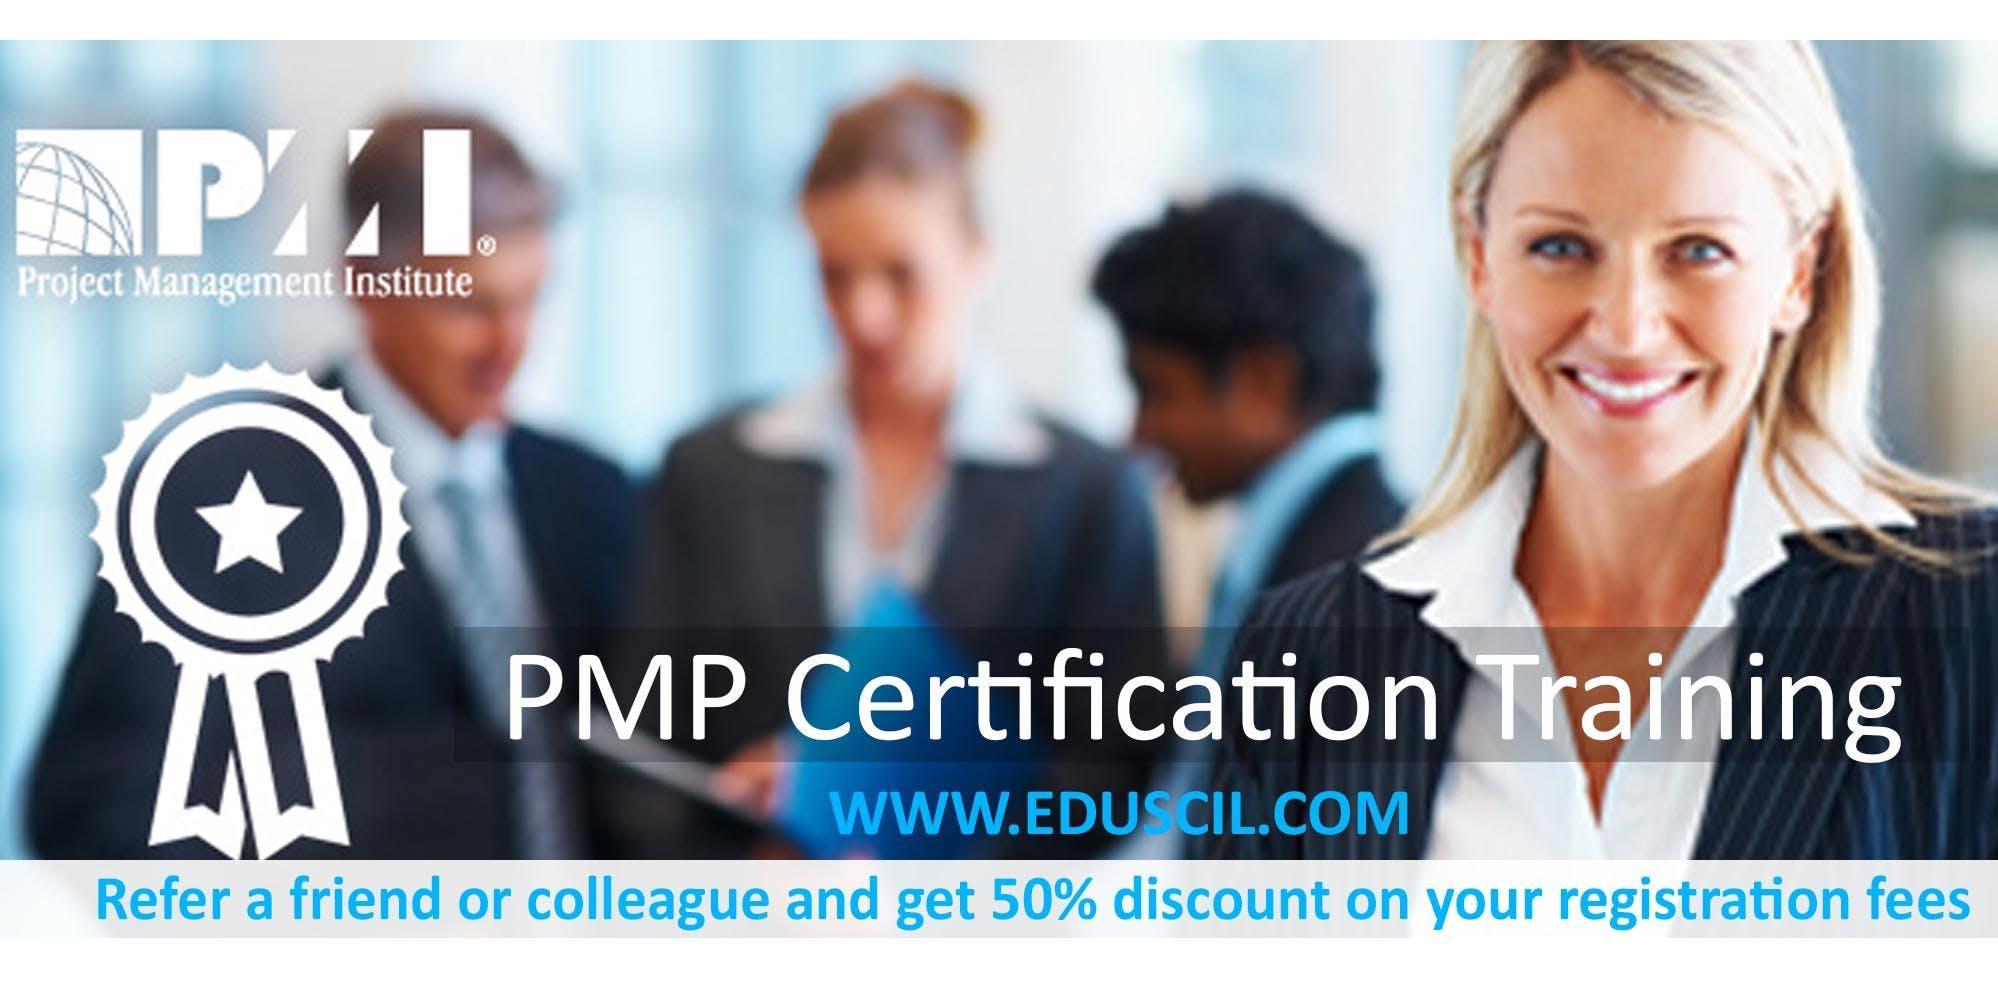 4 Days PMP Training Workshop at San Francisco